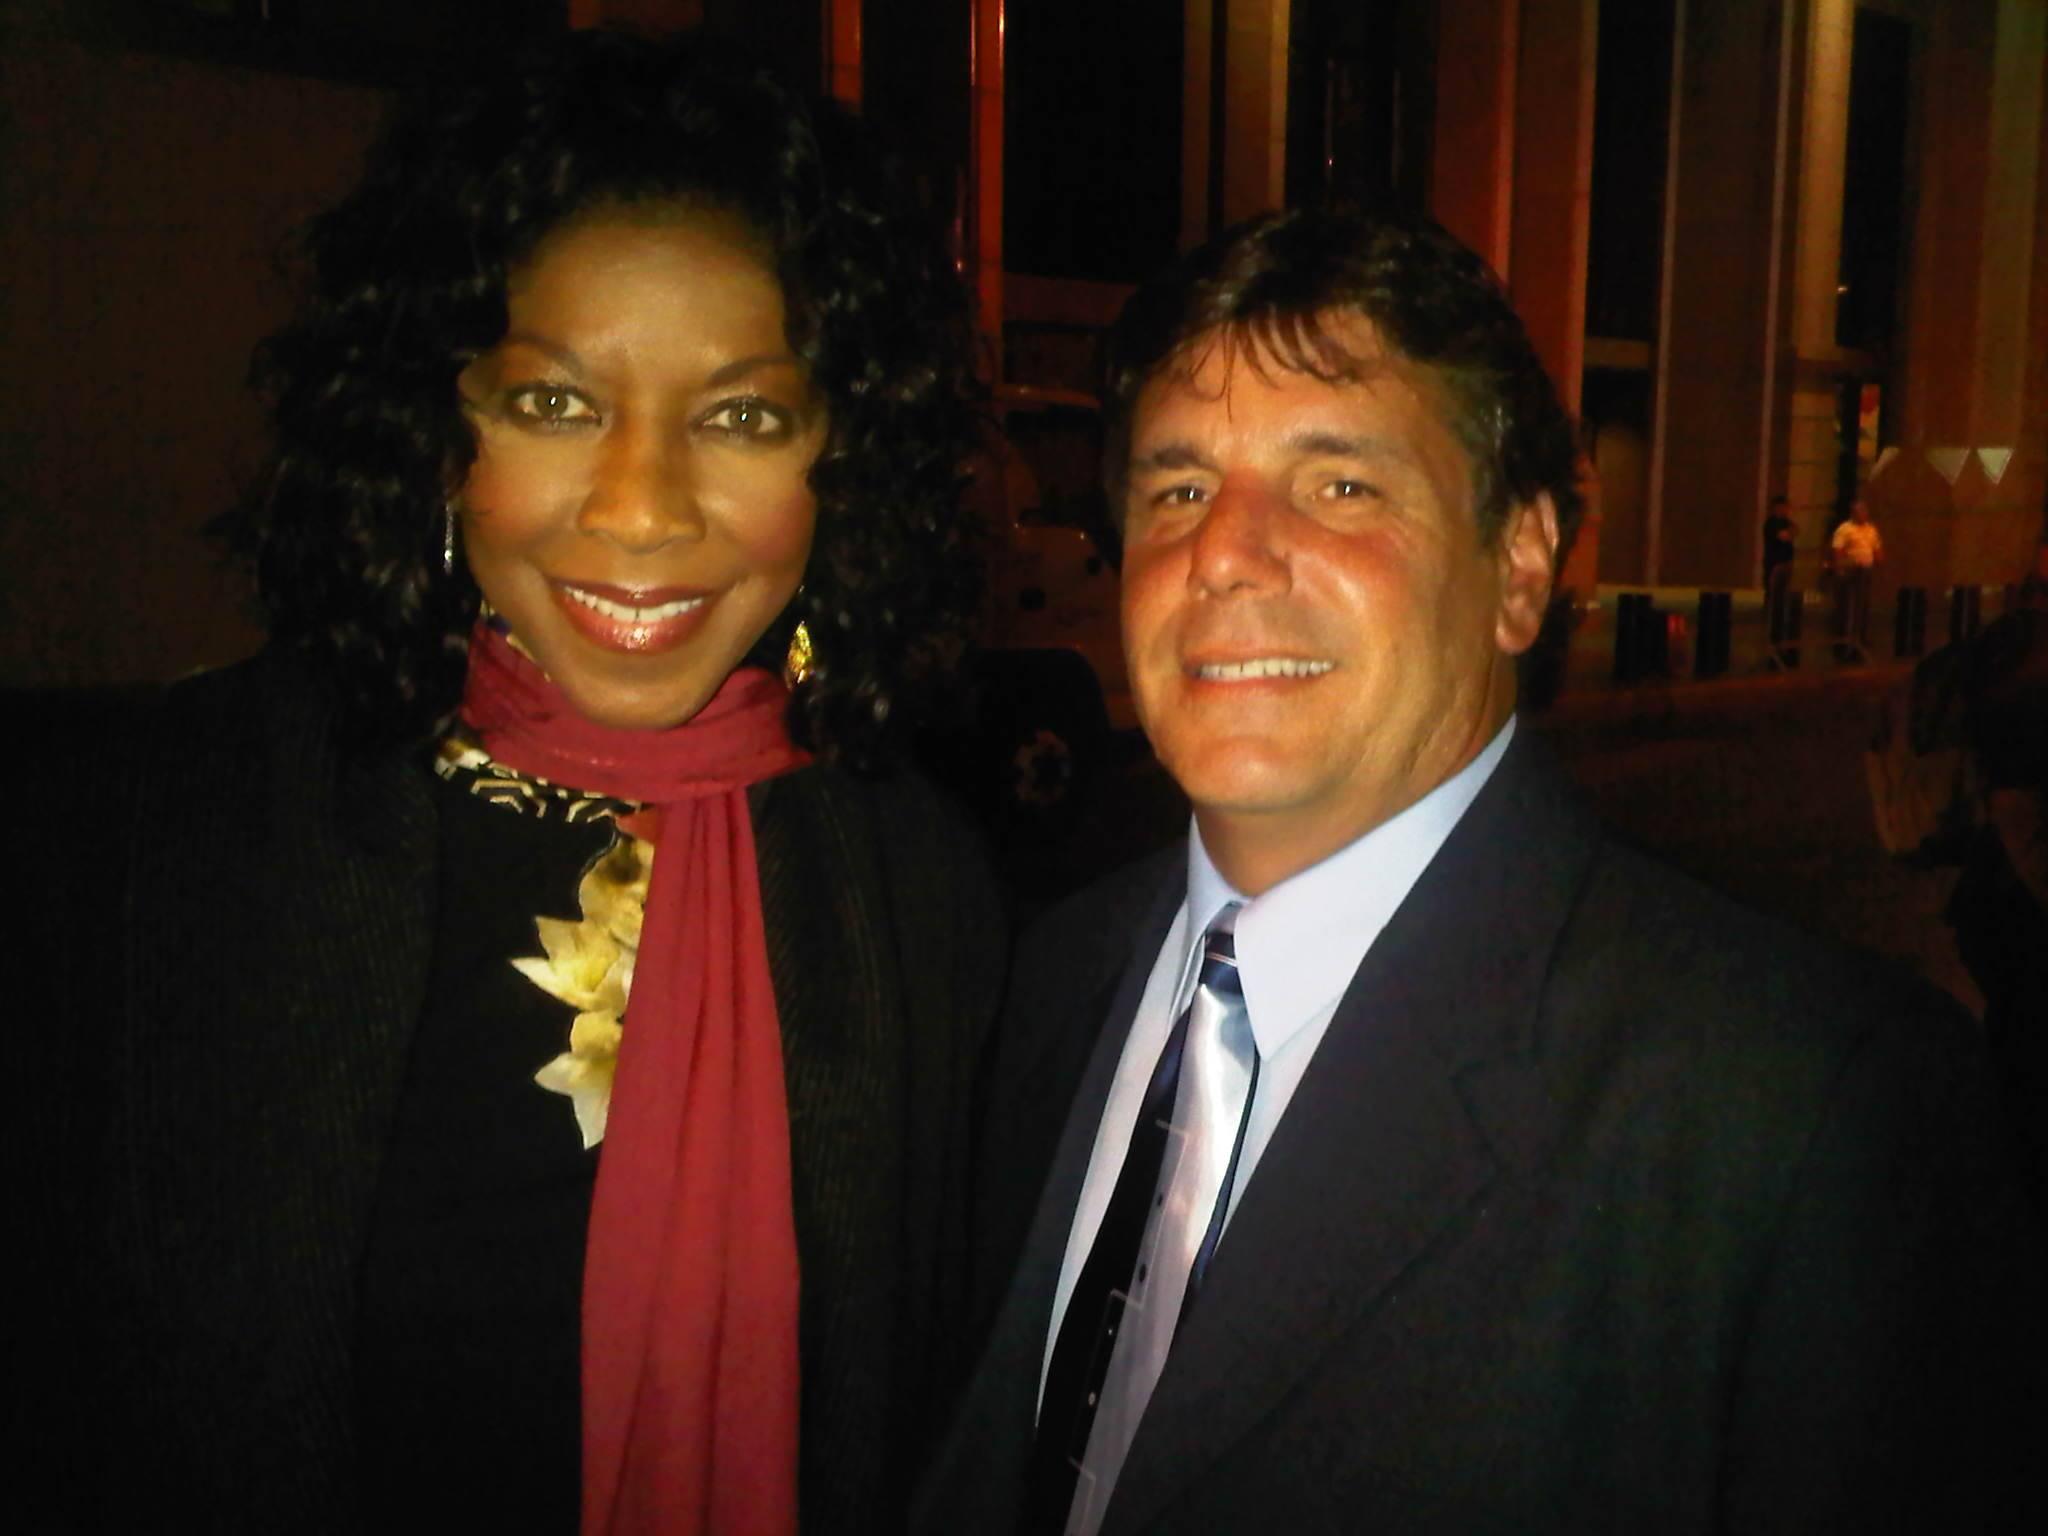 Chuck Aiesi & Natalie Cole at Tony Bennetts dinner event